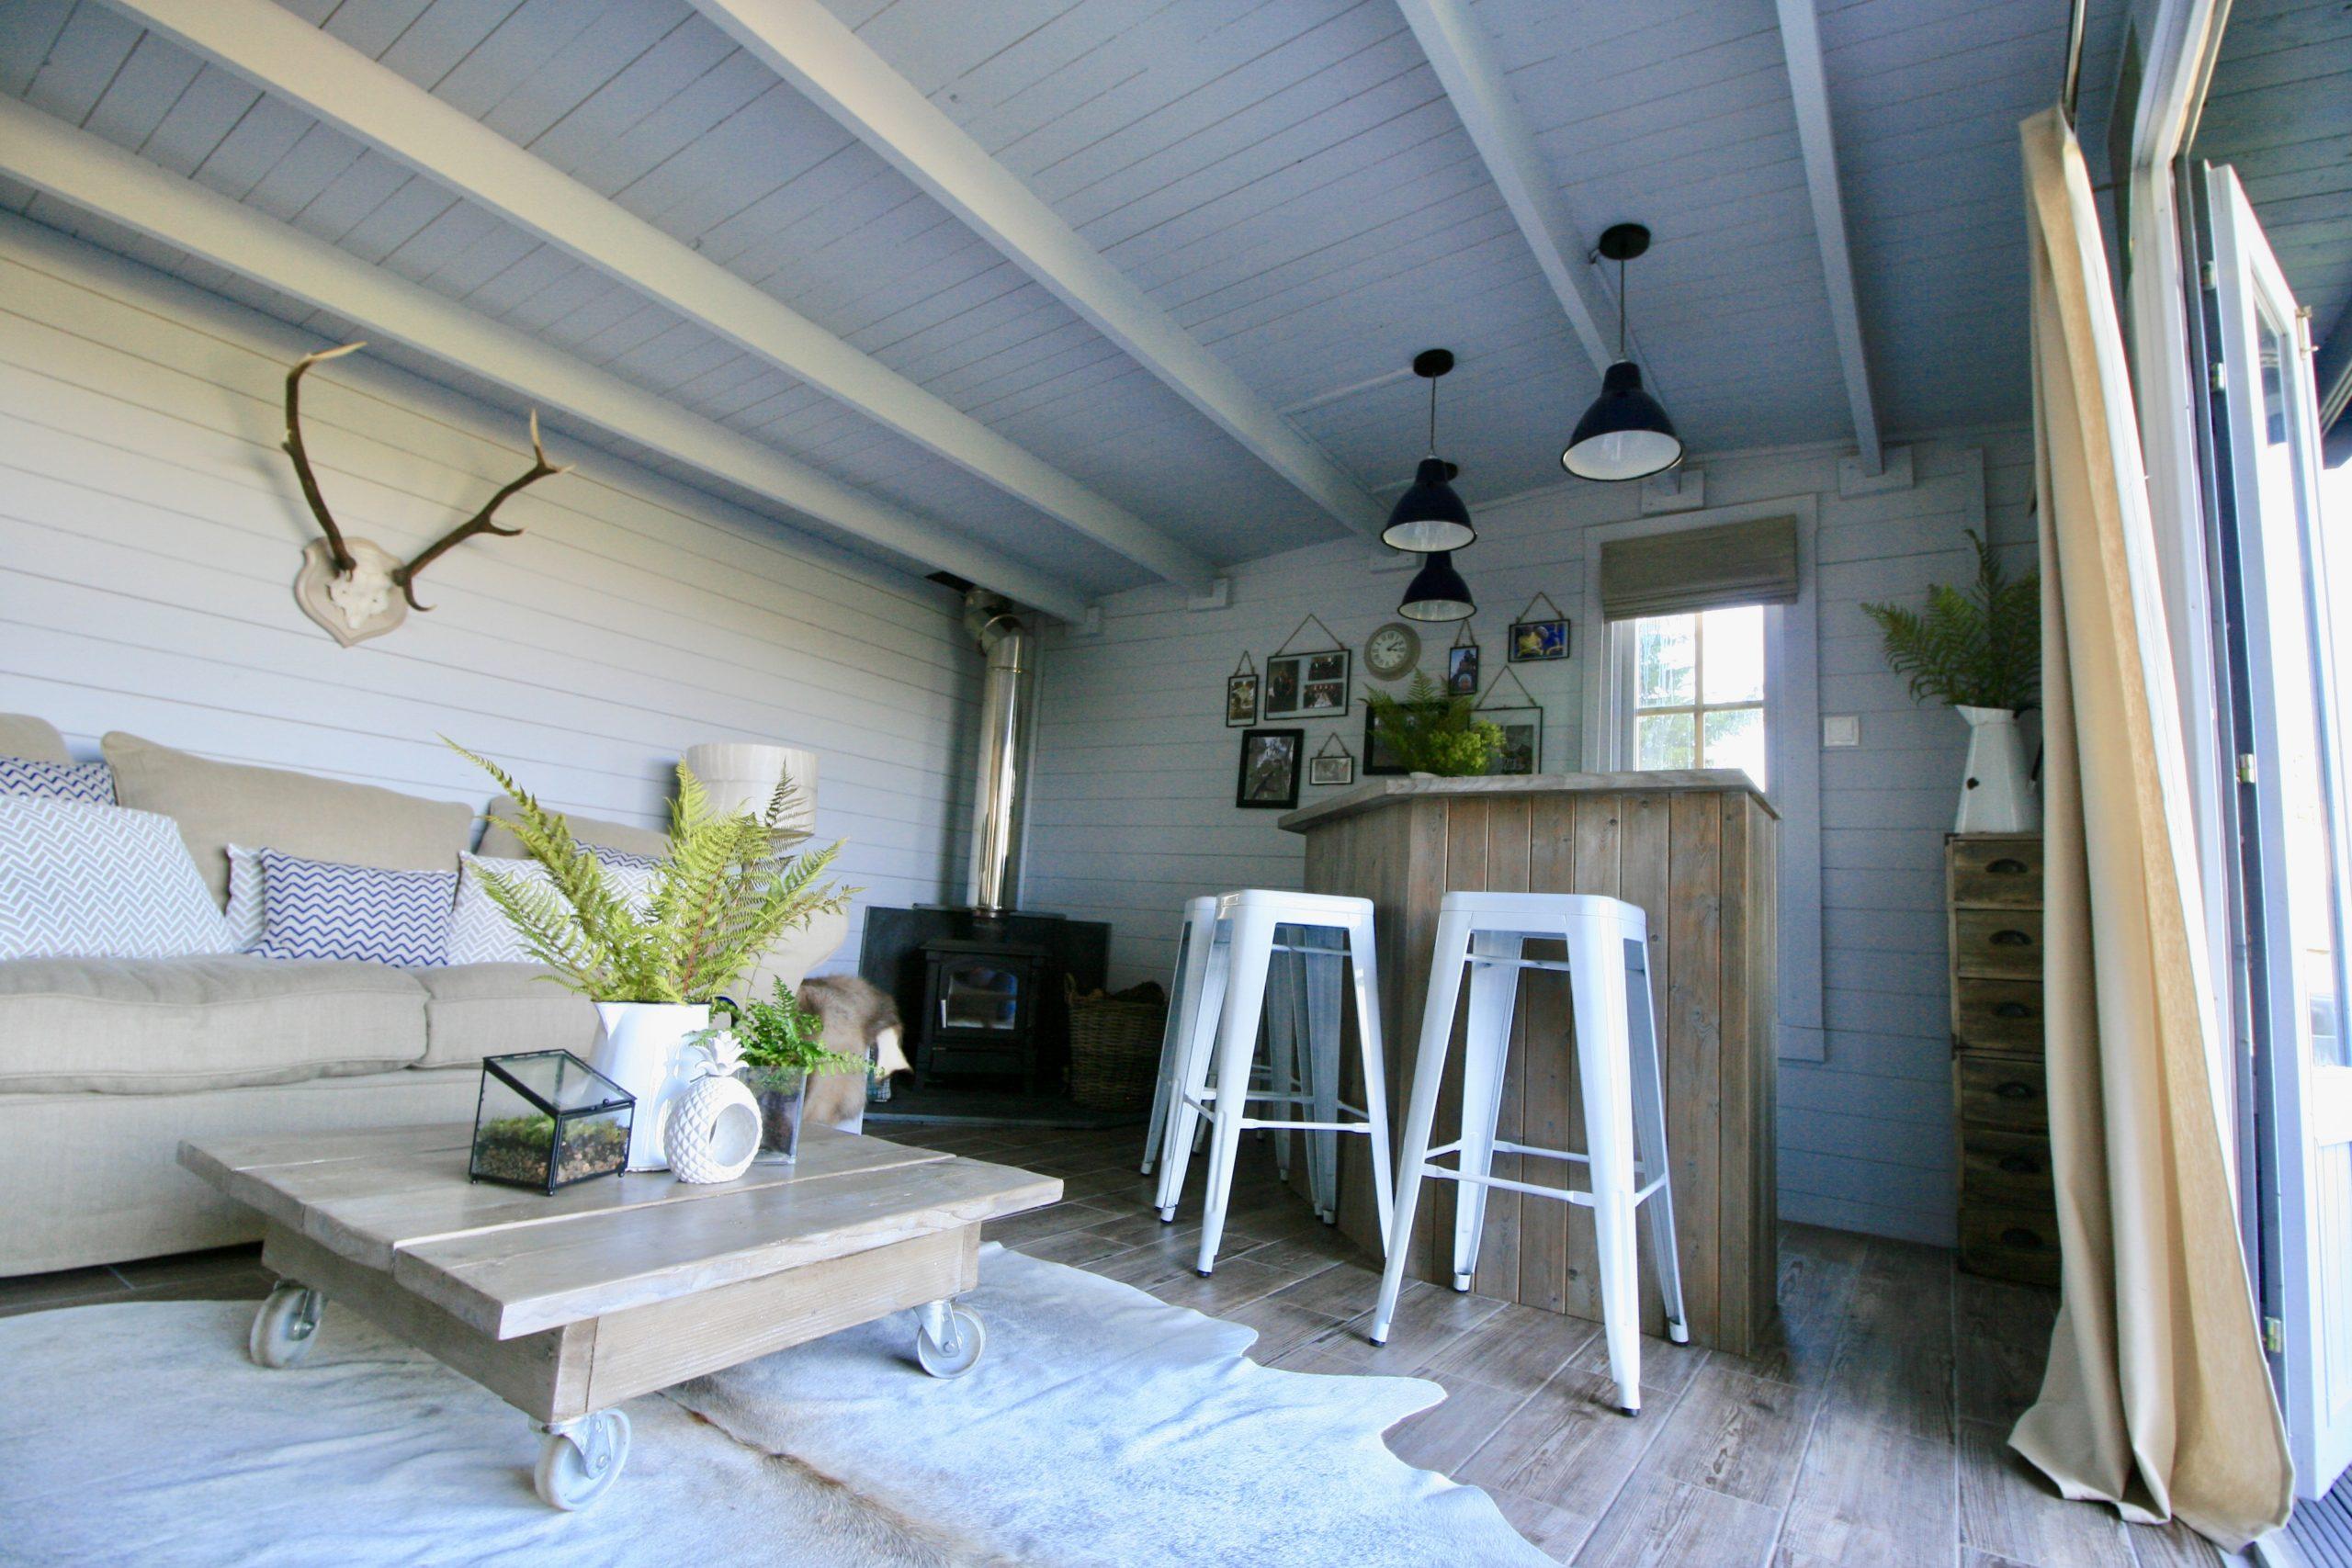 Scandinavian design nordic style summerhouse designed by Amelia Wilson Interiors